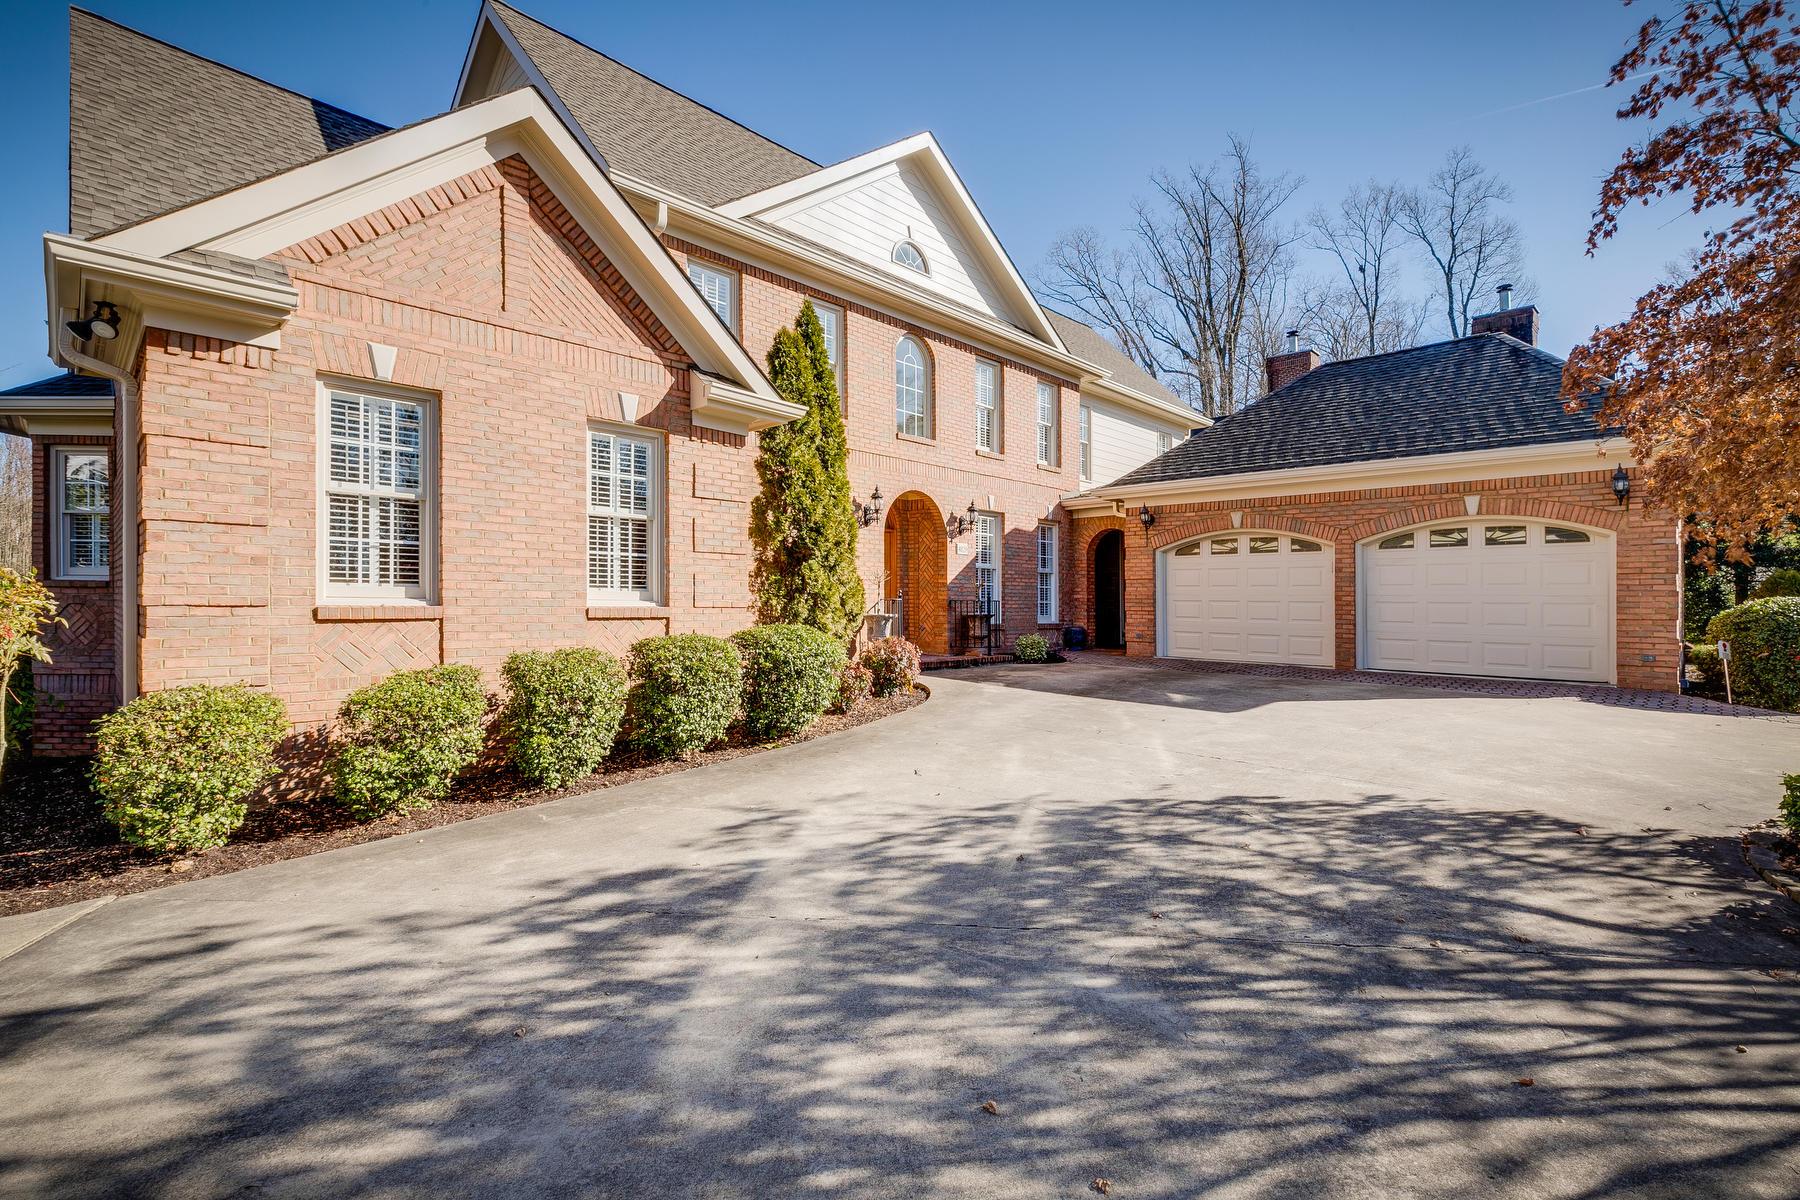 4829 Preston Park Drive, Kingsport, Tennessee 37664, 5 Bedrooms Bedrooms, ,5 BathroomsBathrooms,Single Family,For Sale,4829 Preston Park Drive,2,9903595